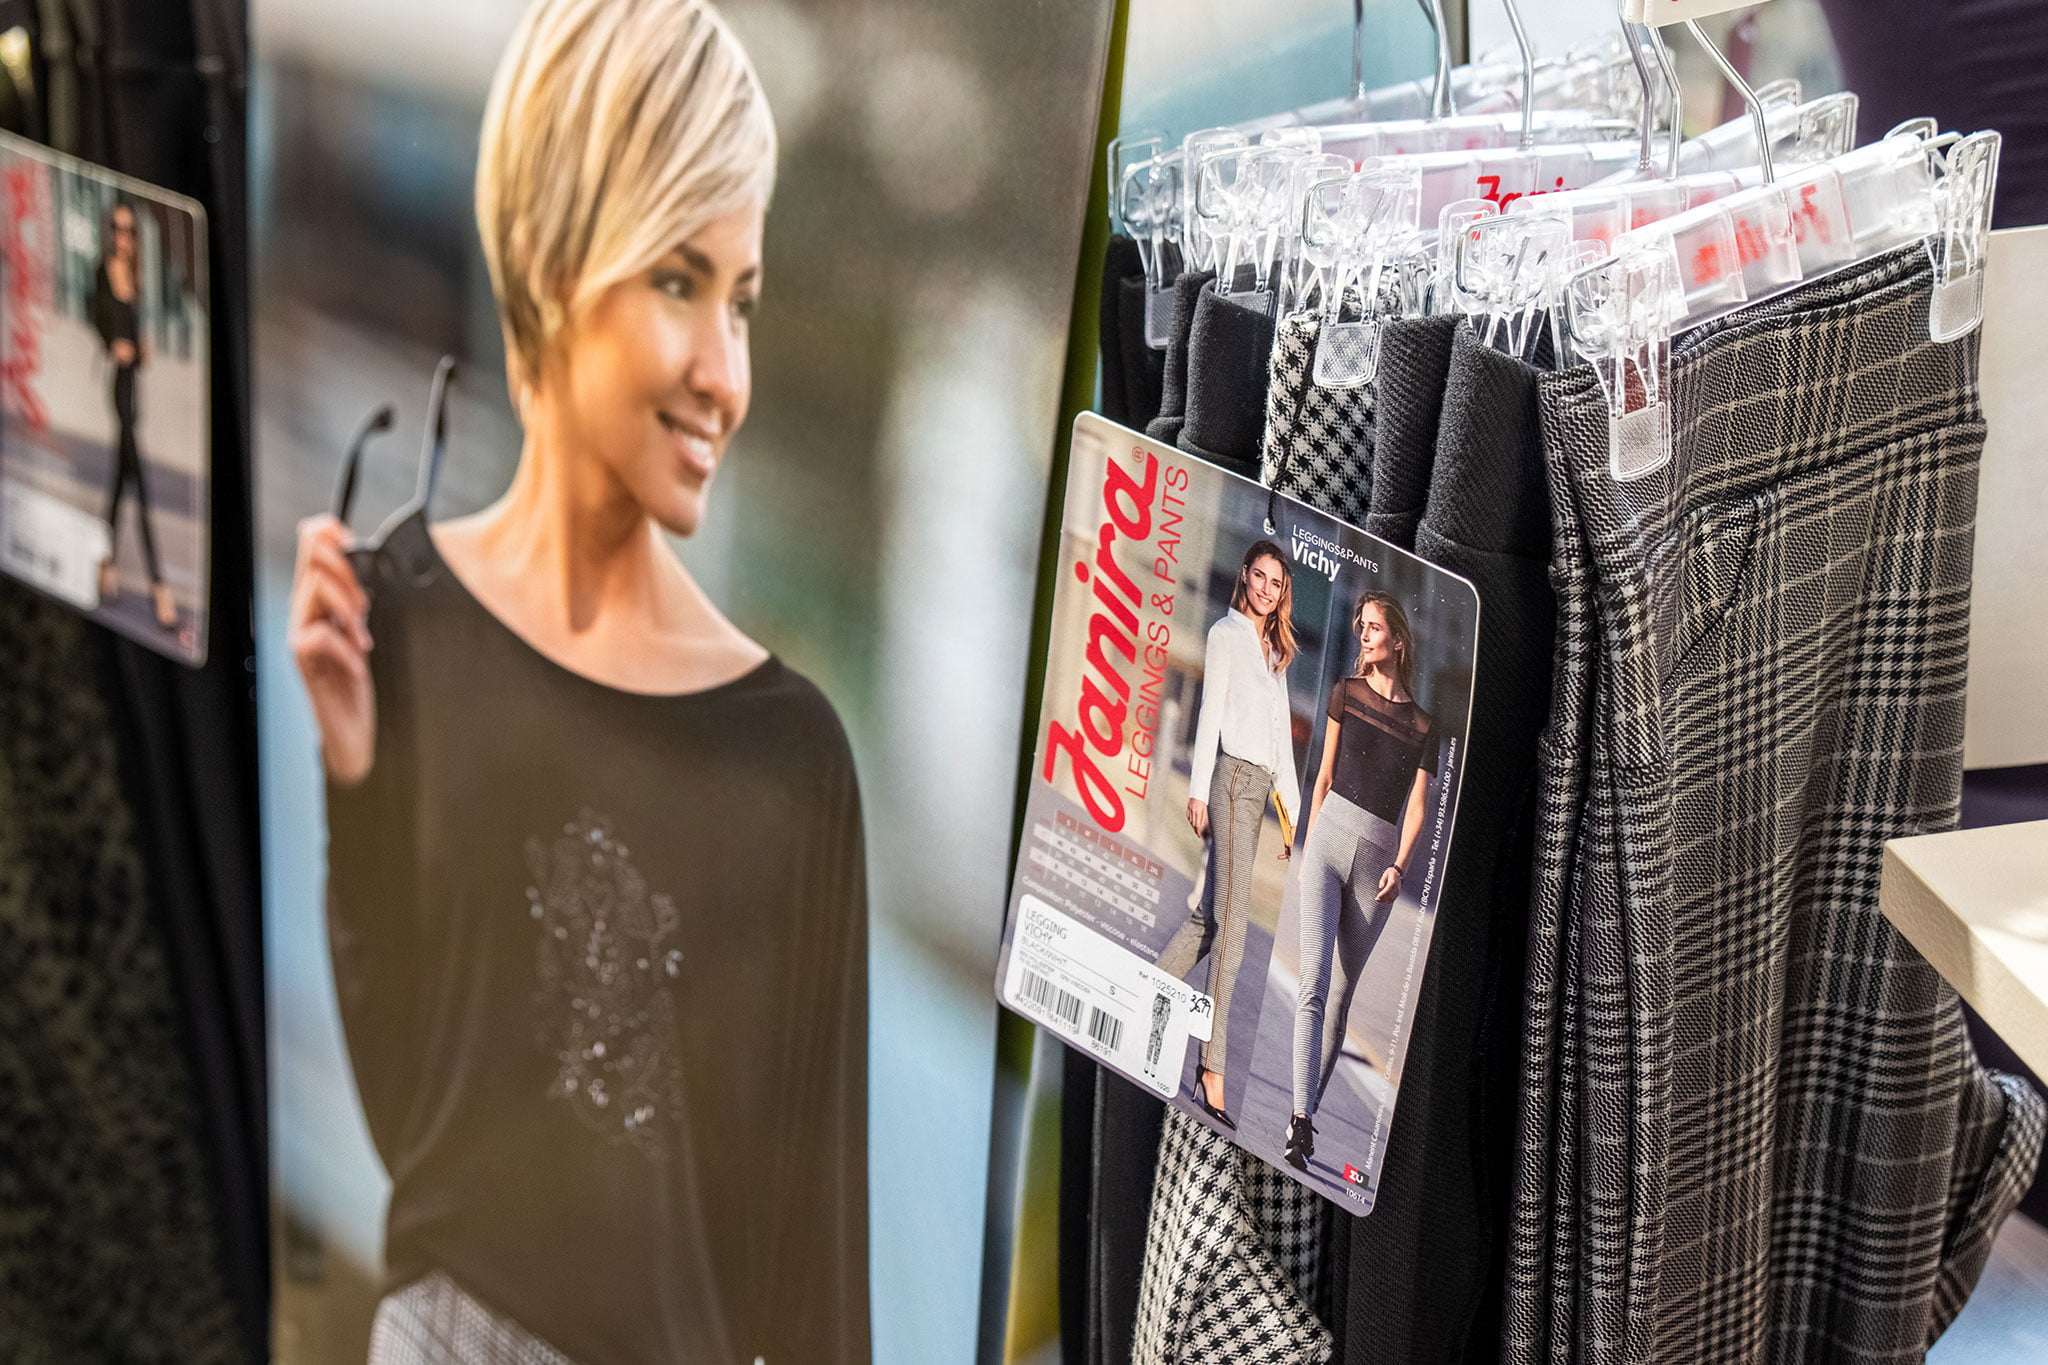 Comprar leggings Janira en Dénia – Leveleleven